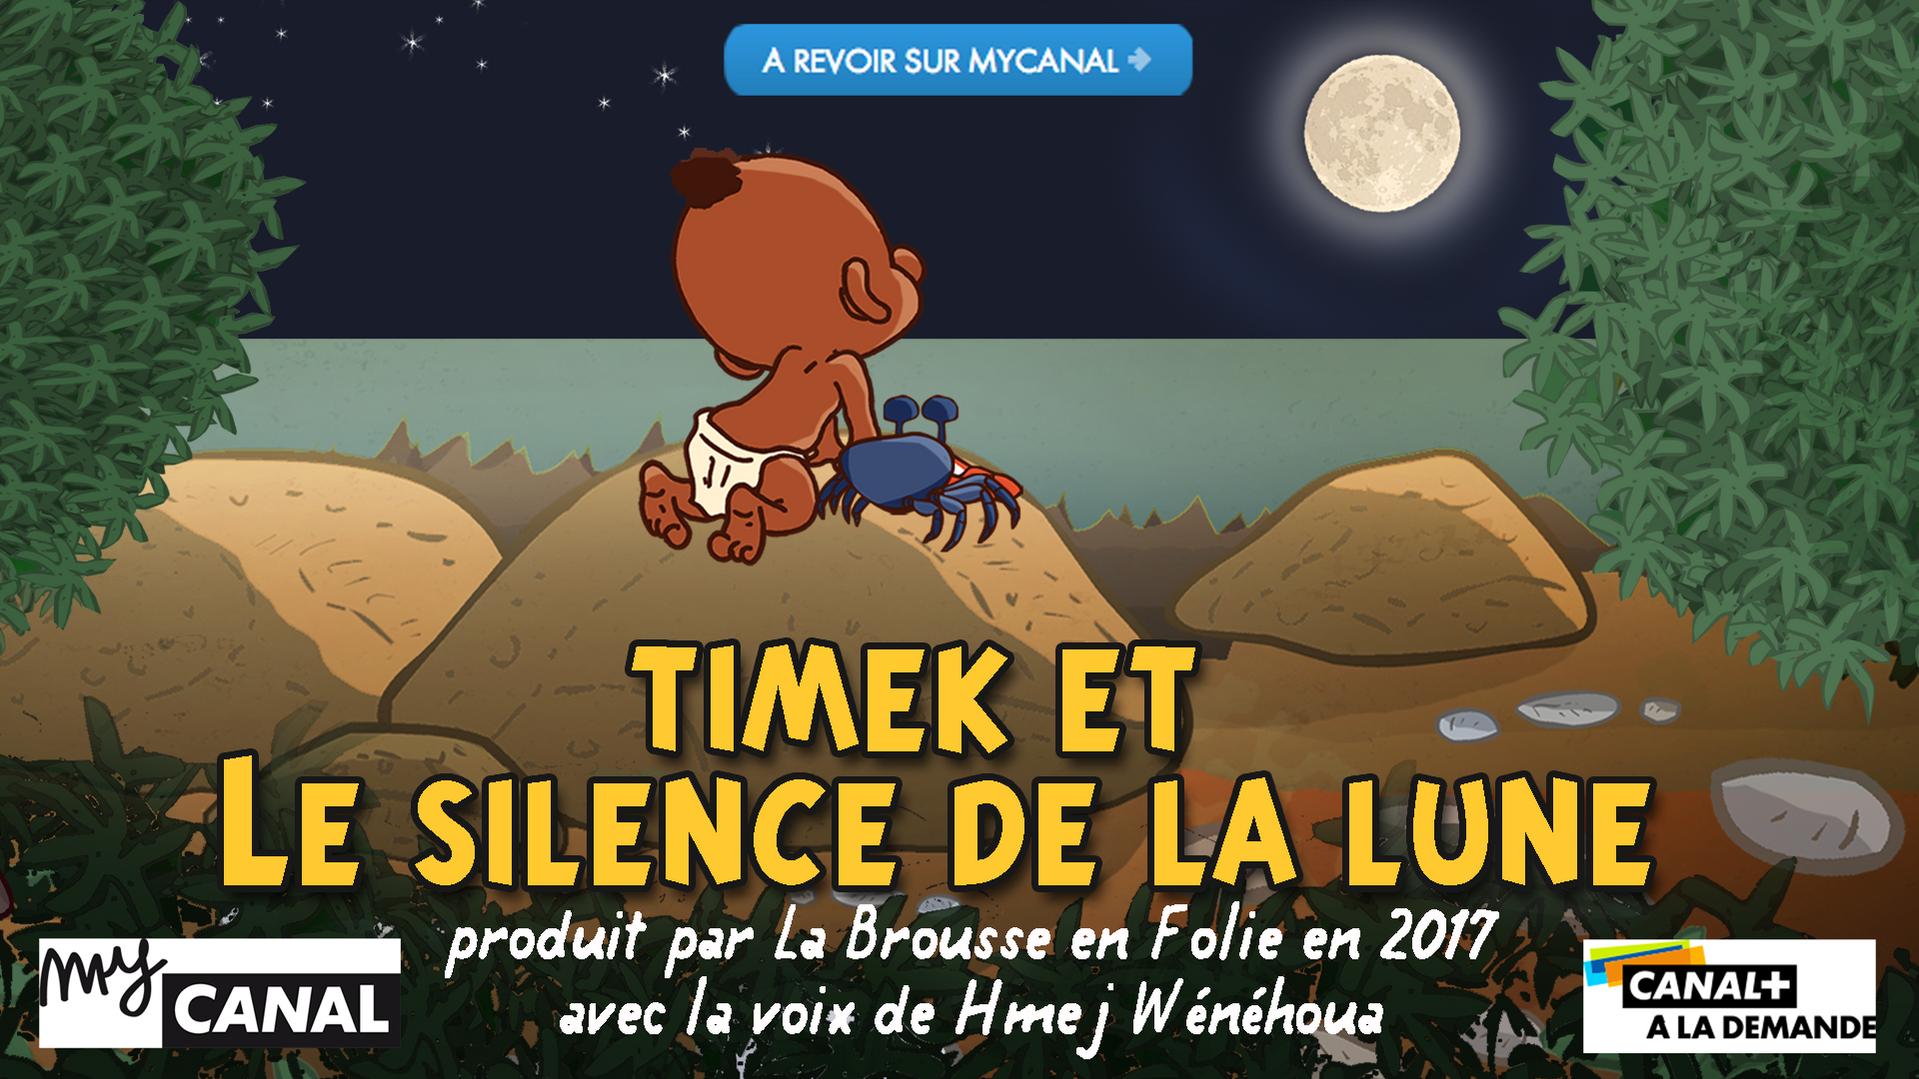 Le silence de la lune